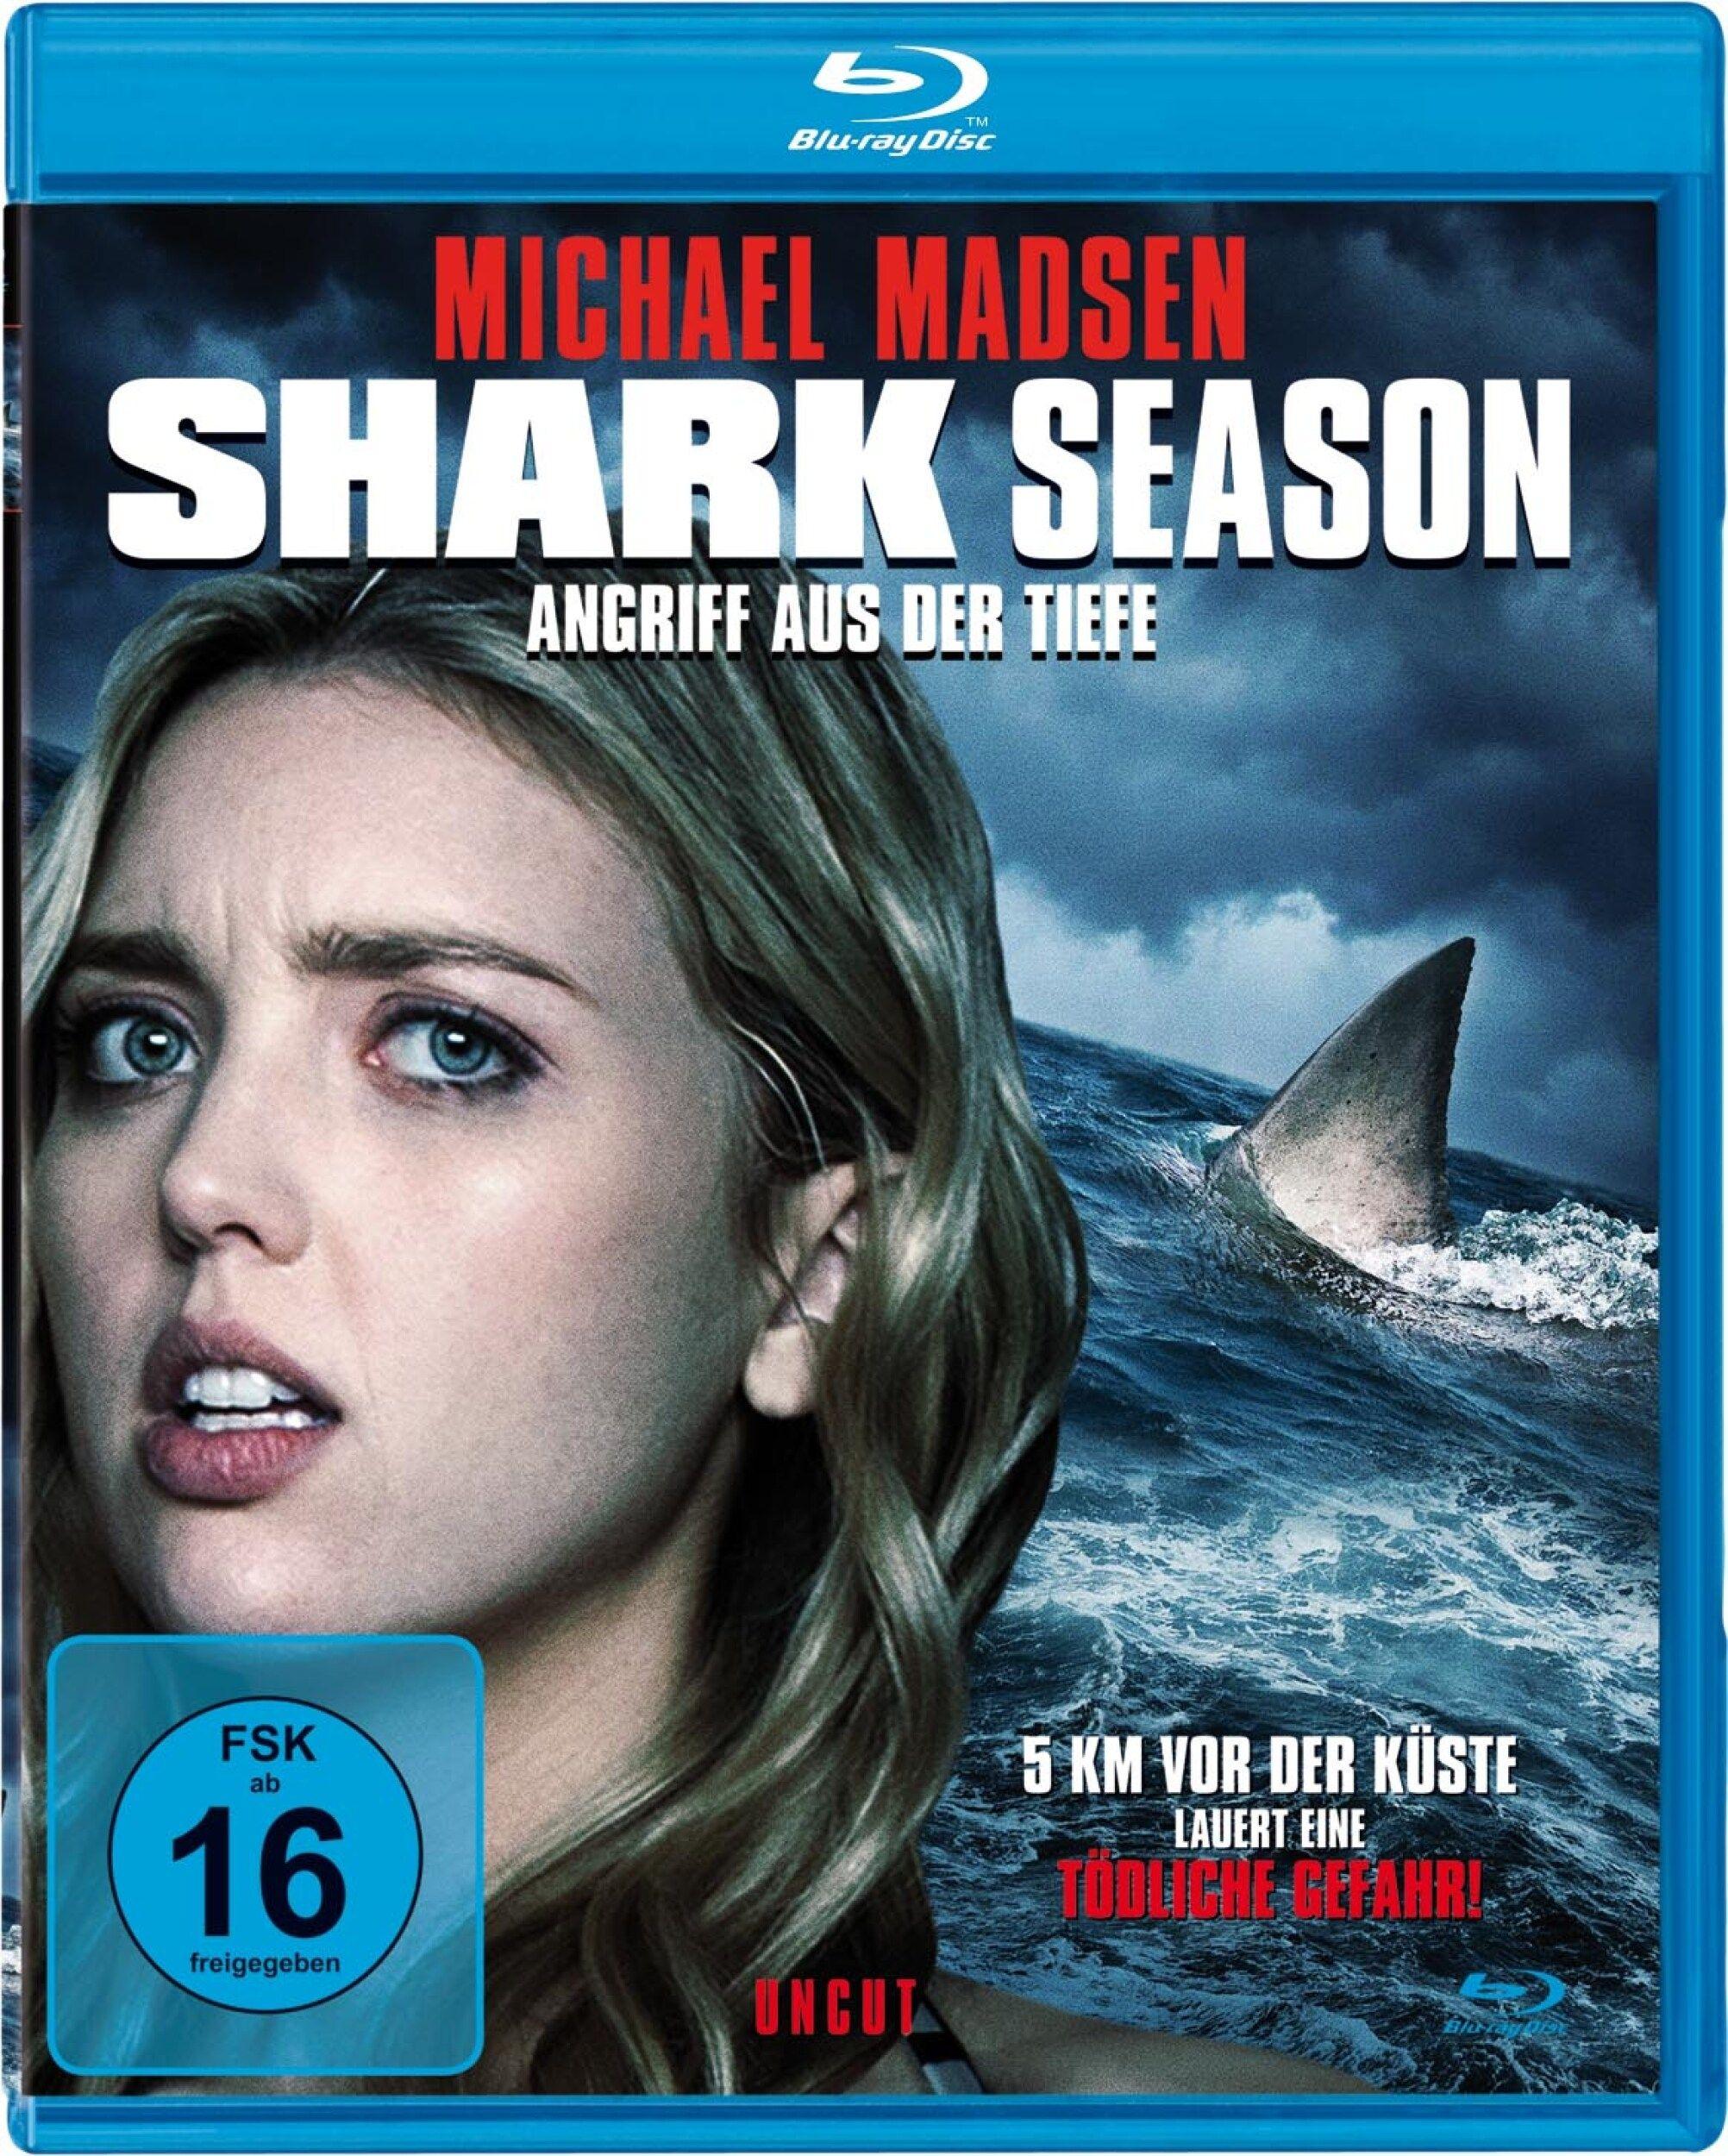 Shark Season - Angriff aus der Tiefe (BLURAY)